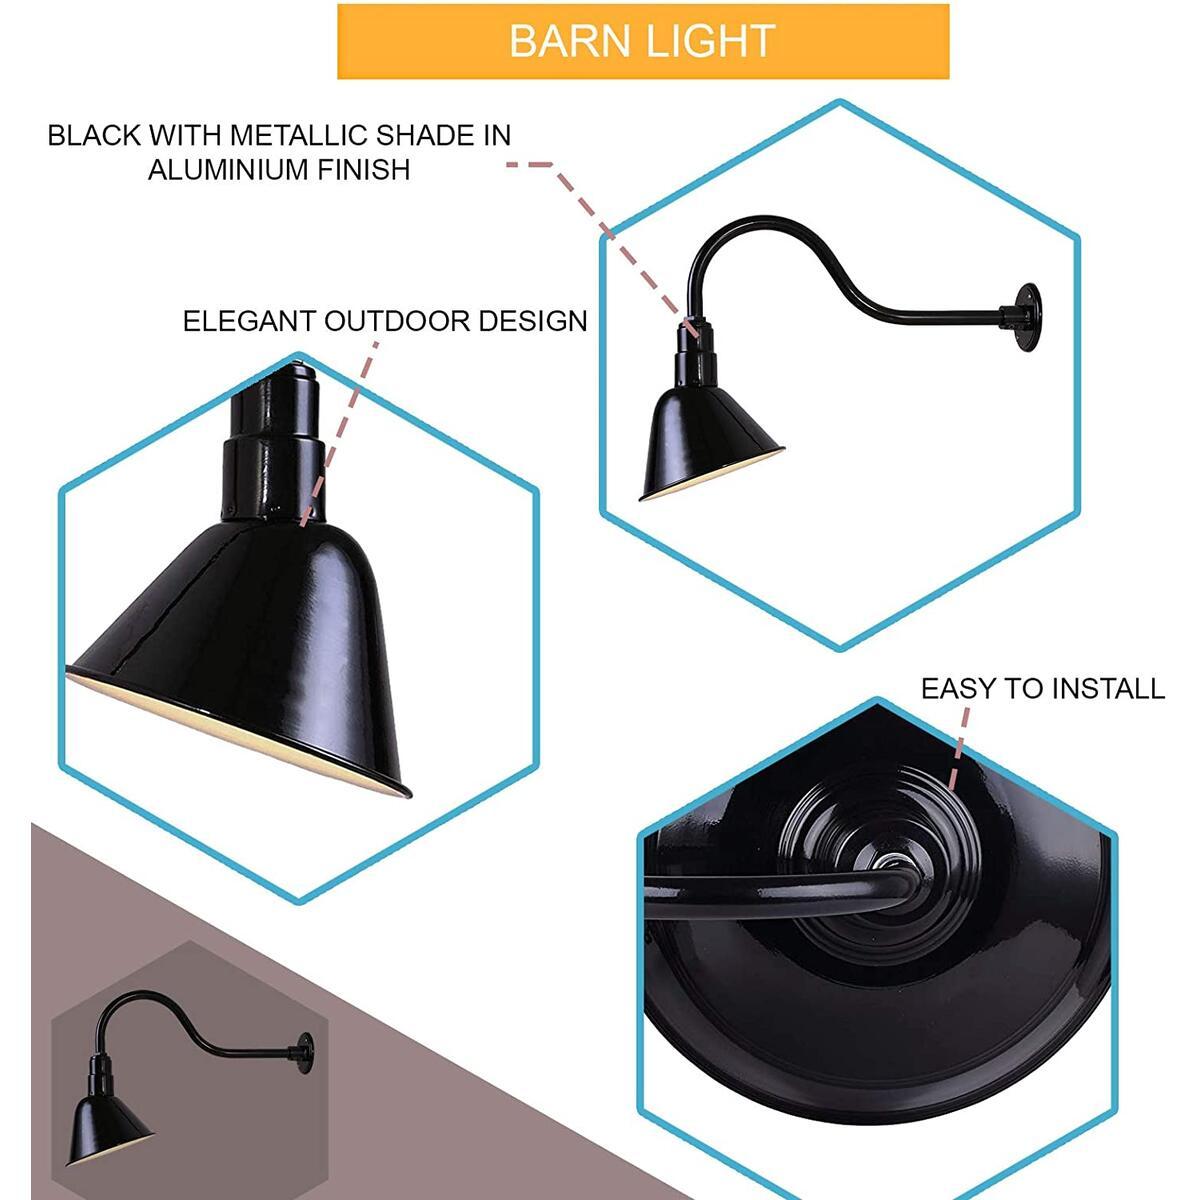 10 Inch Outdoor Aluminum Barn Light - 2 Pack